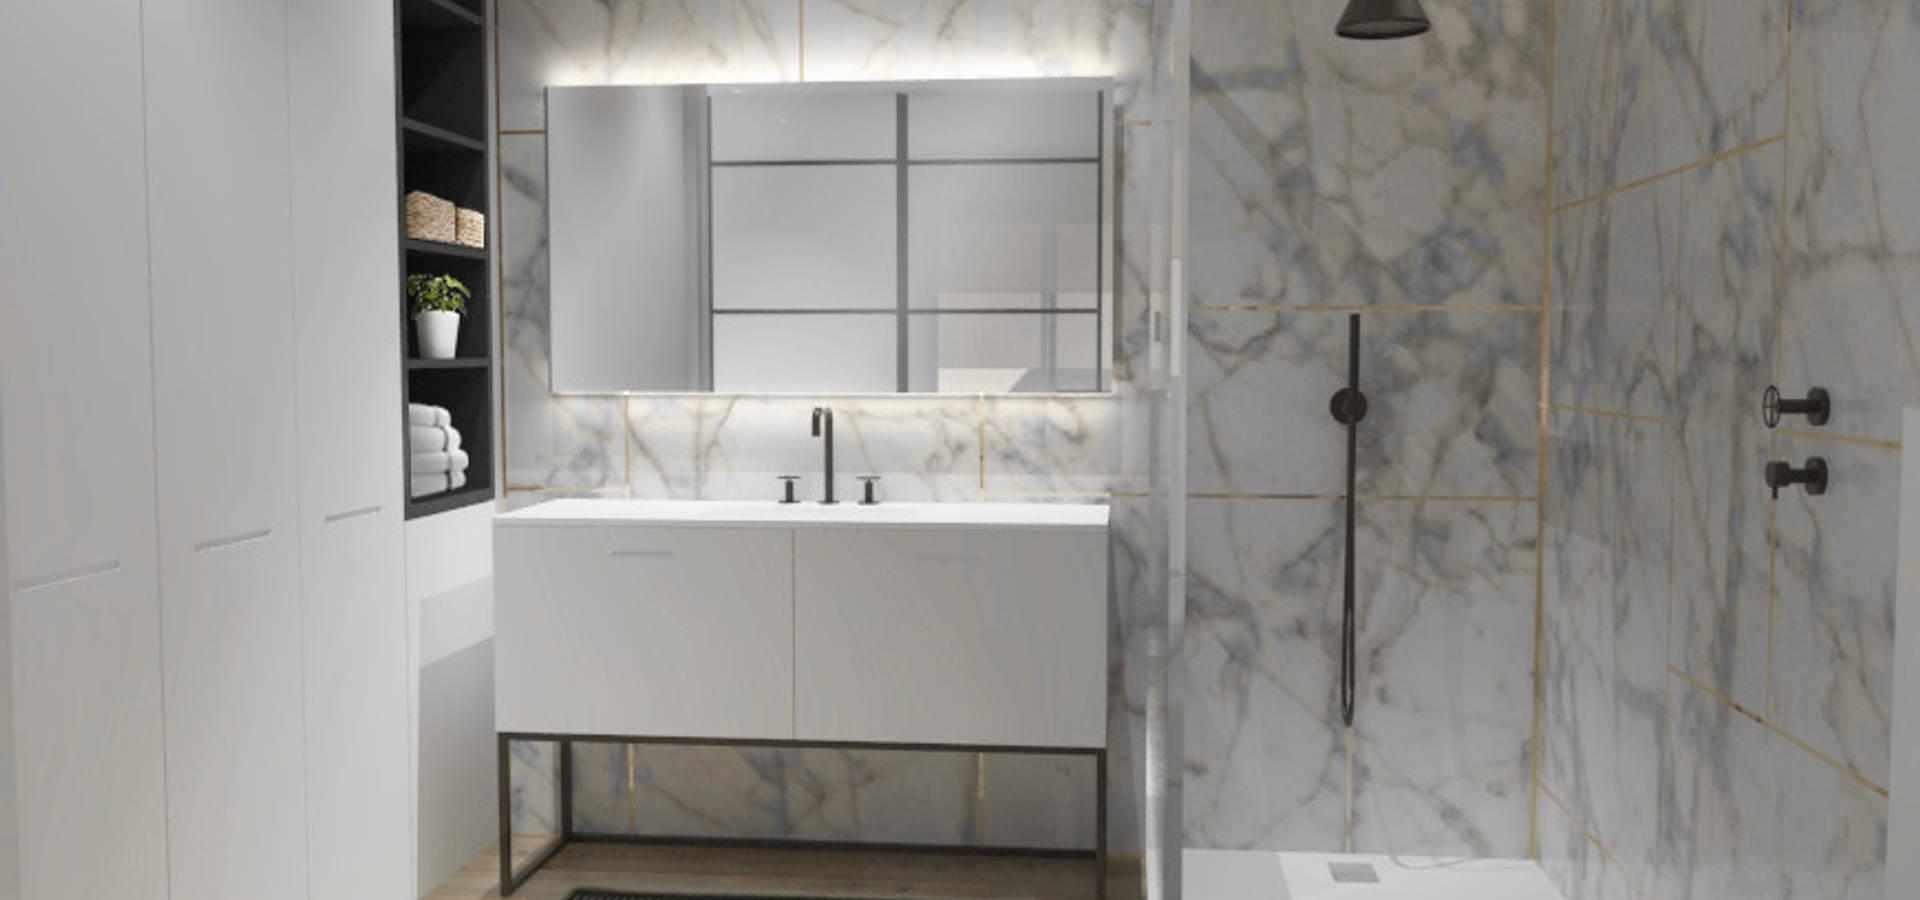 Upper interiorismo arquitectos de interiores en getxo - Interiorismo getxo ...